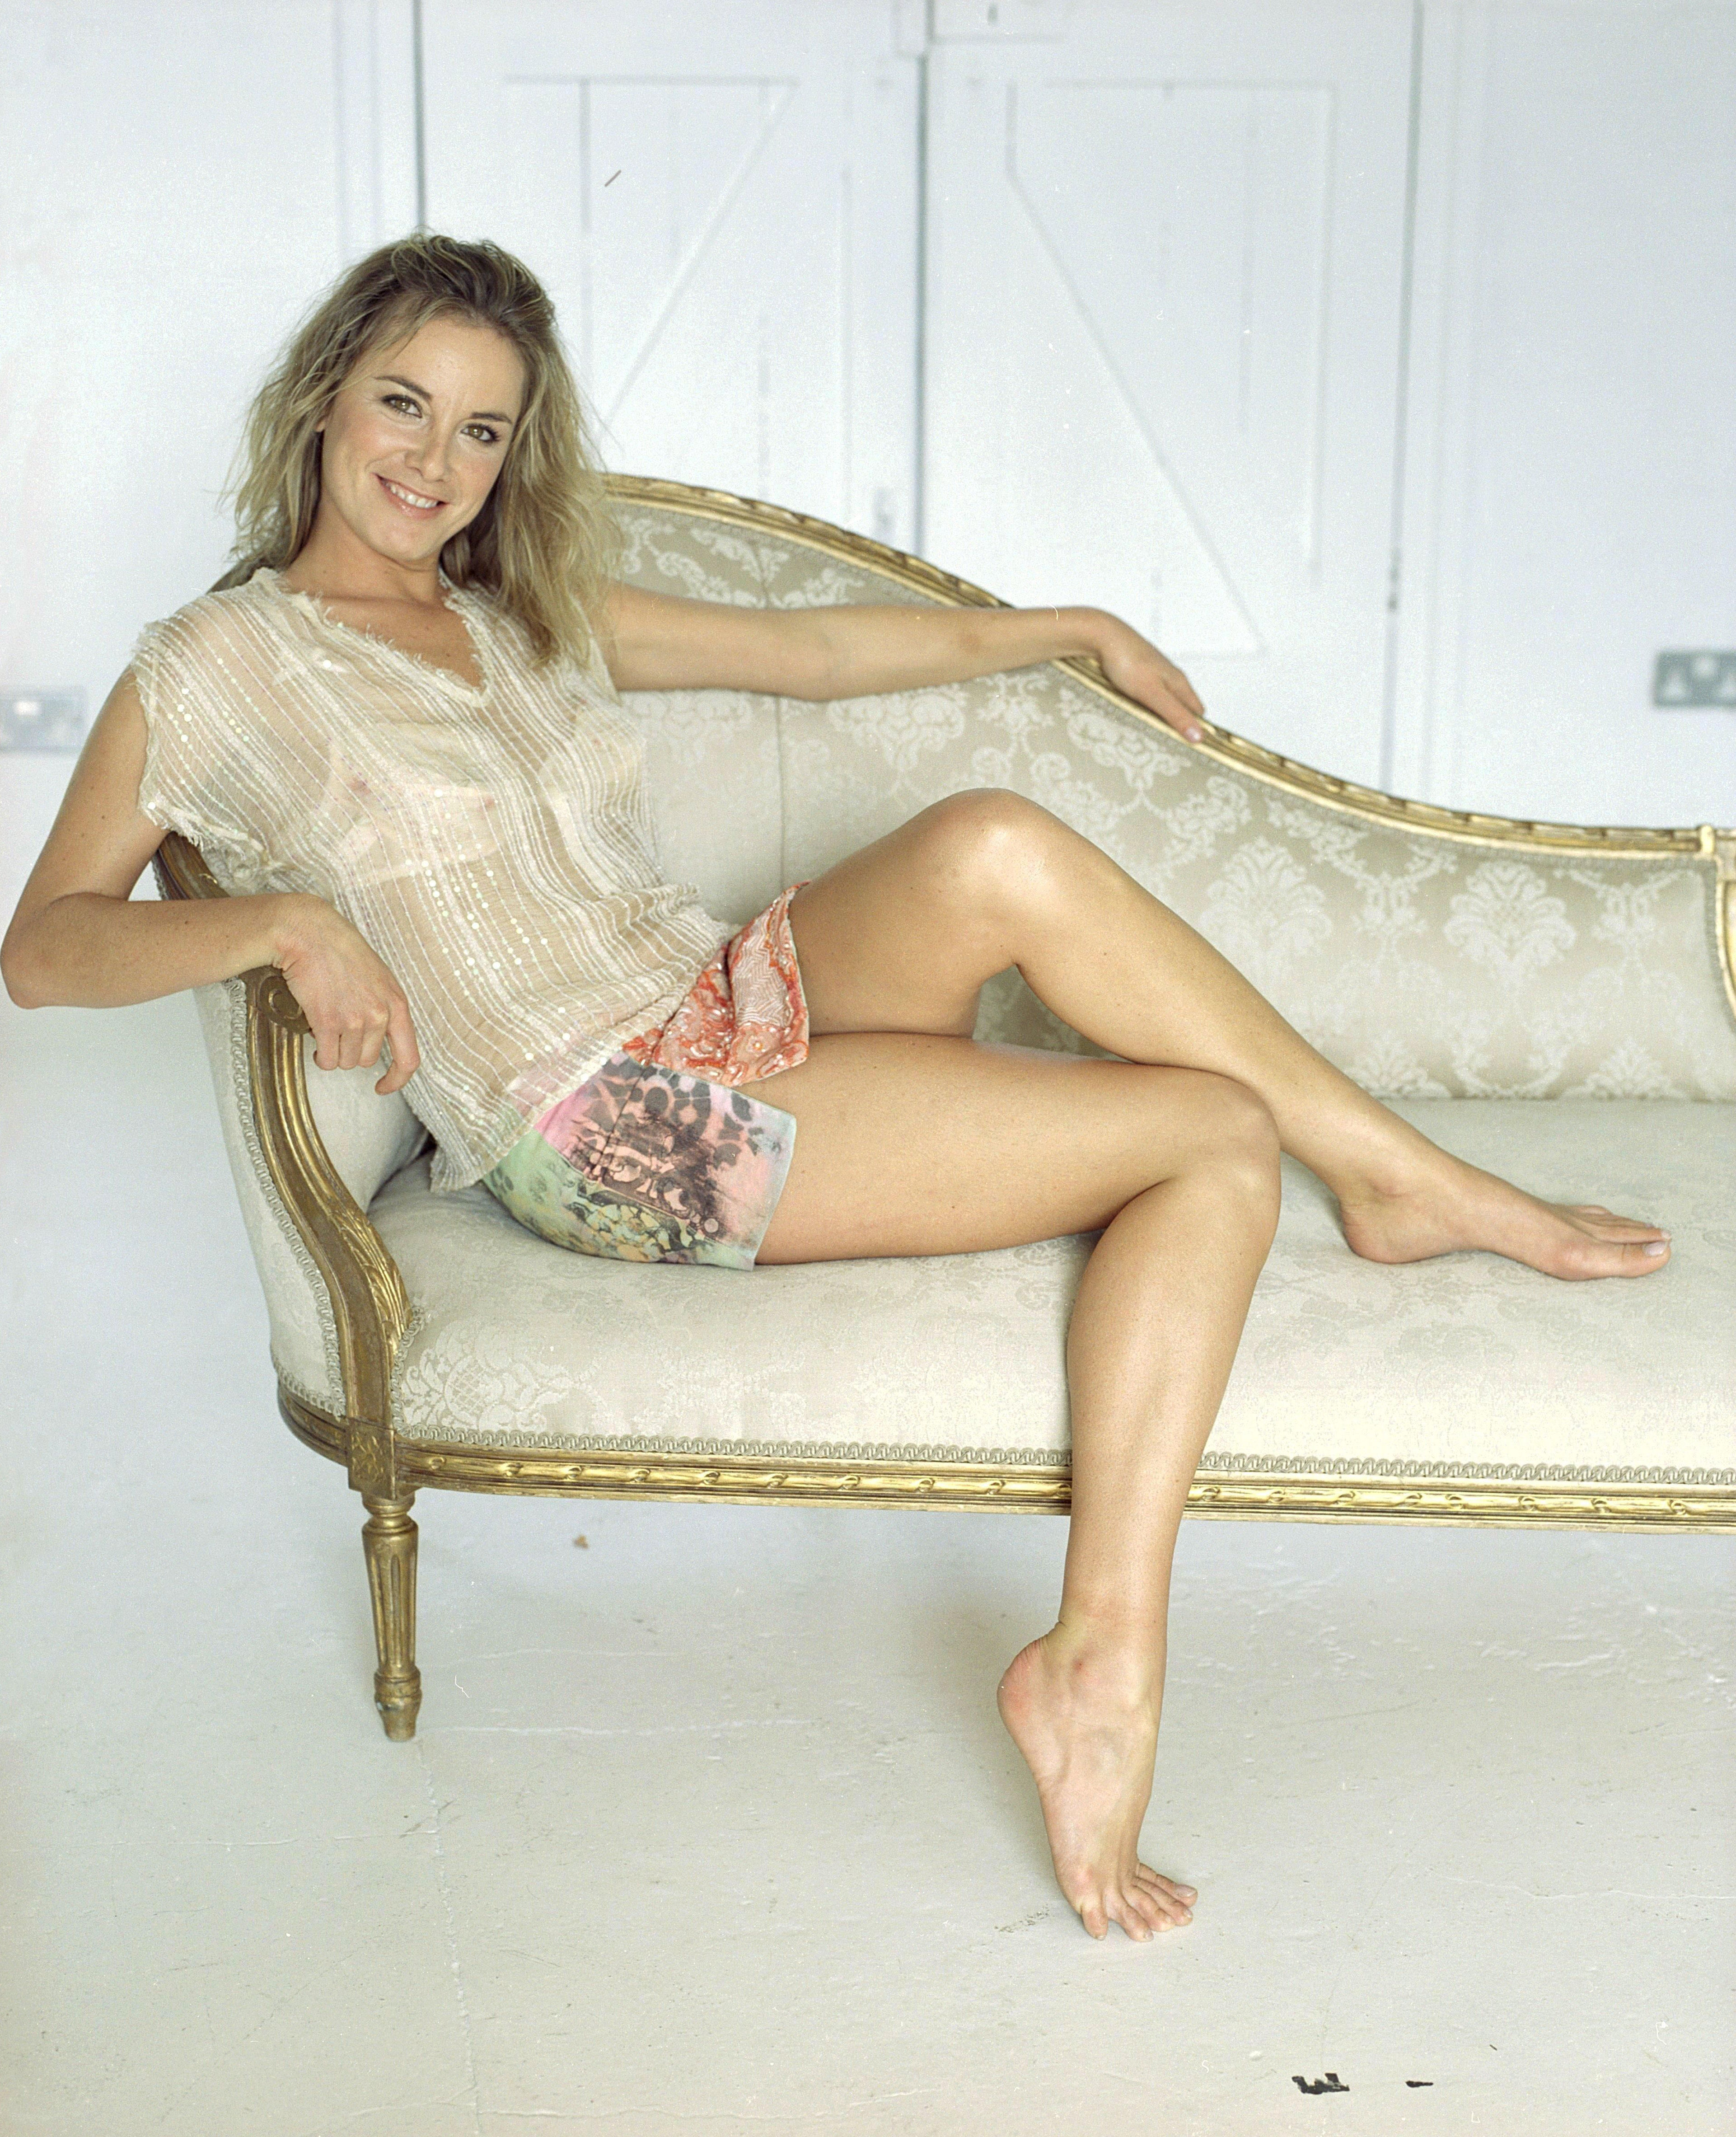 Bikini Natalie MBikinienet nudes (89 photo), Sexy, Cleavage, Instagram, cameltoe 2020